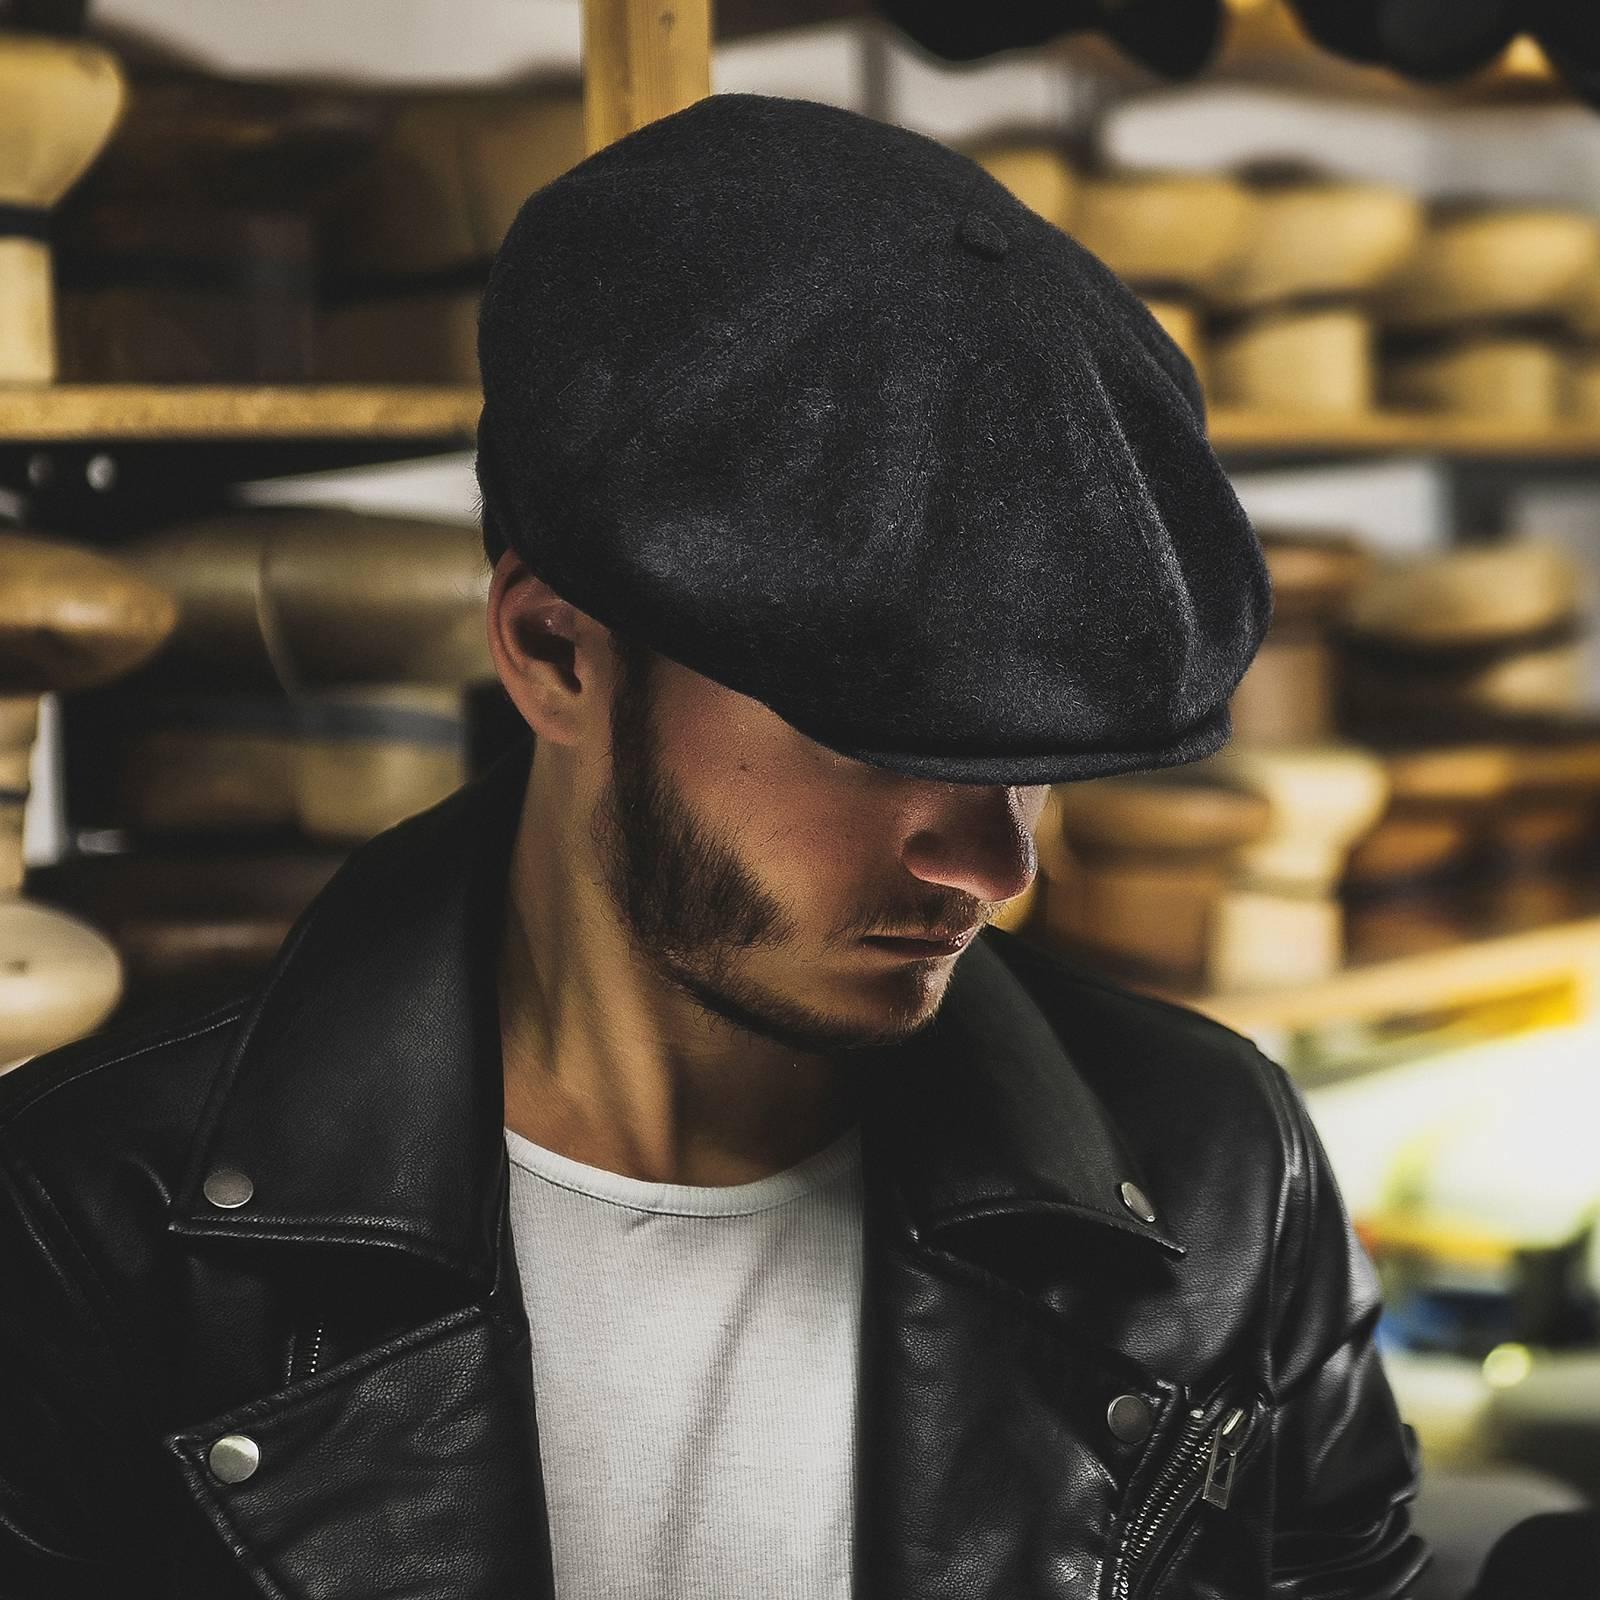 Mütze Peaky Blinders - 100% Wolle, coole wintermütze, männer mütze